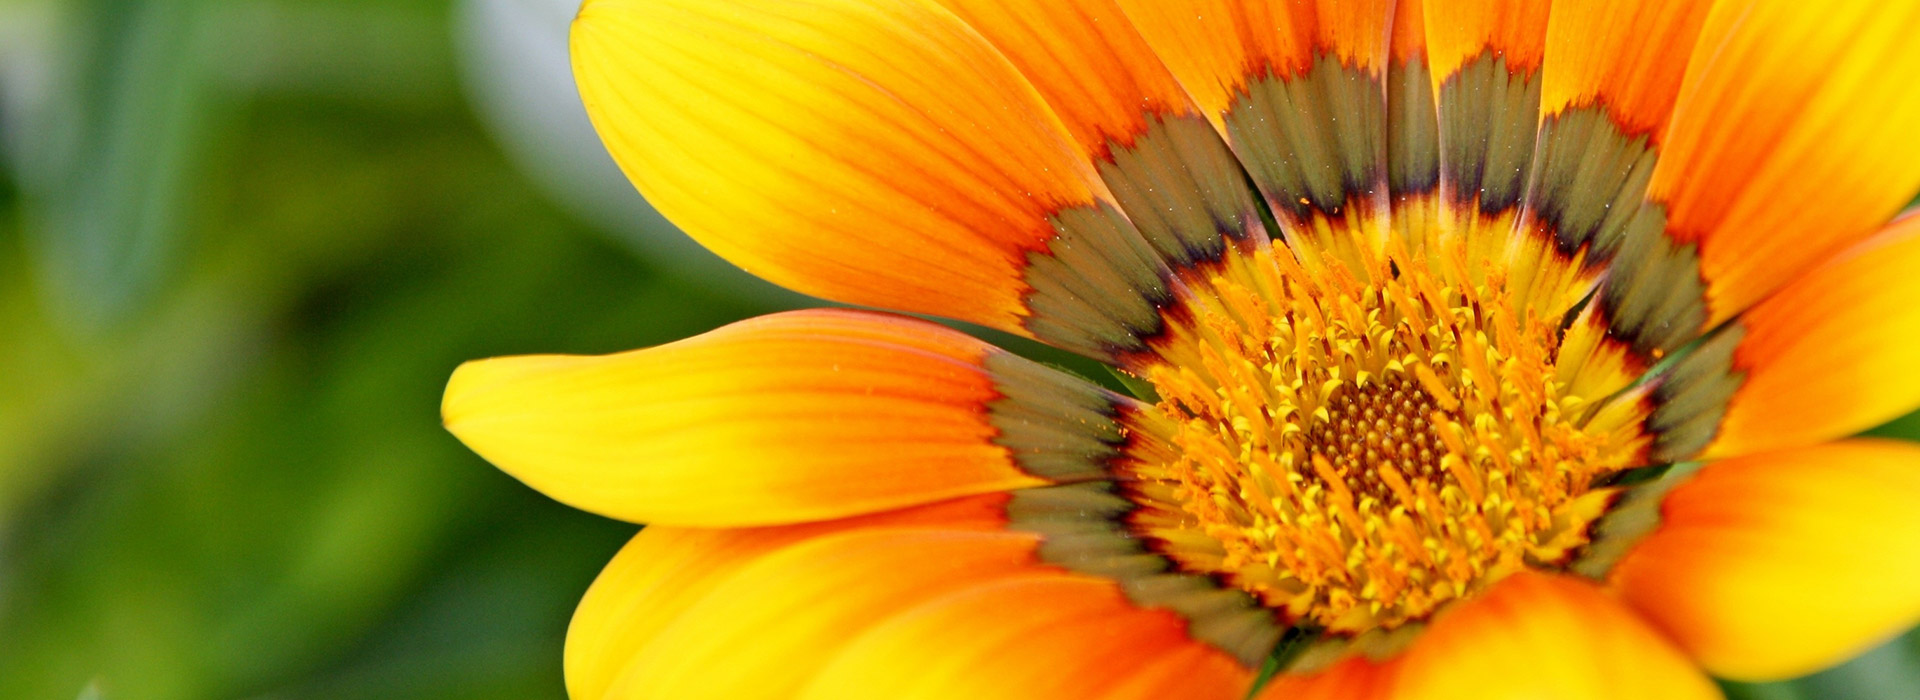 fleur jaune orangée